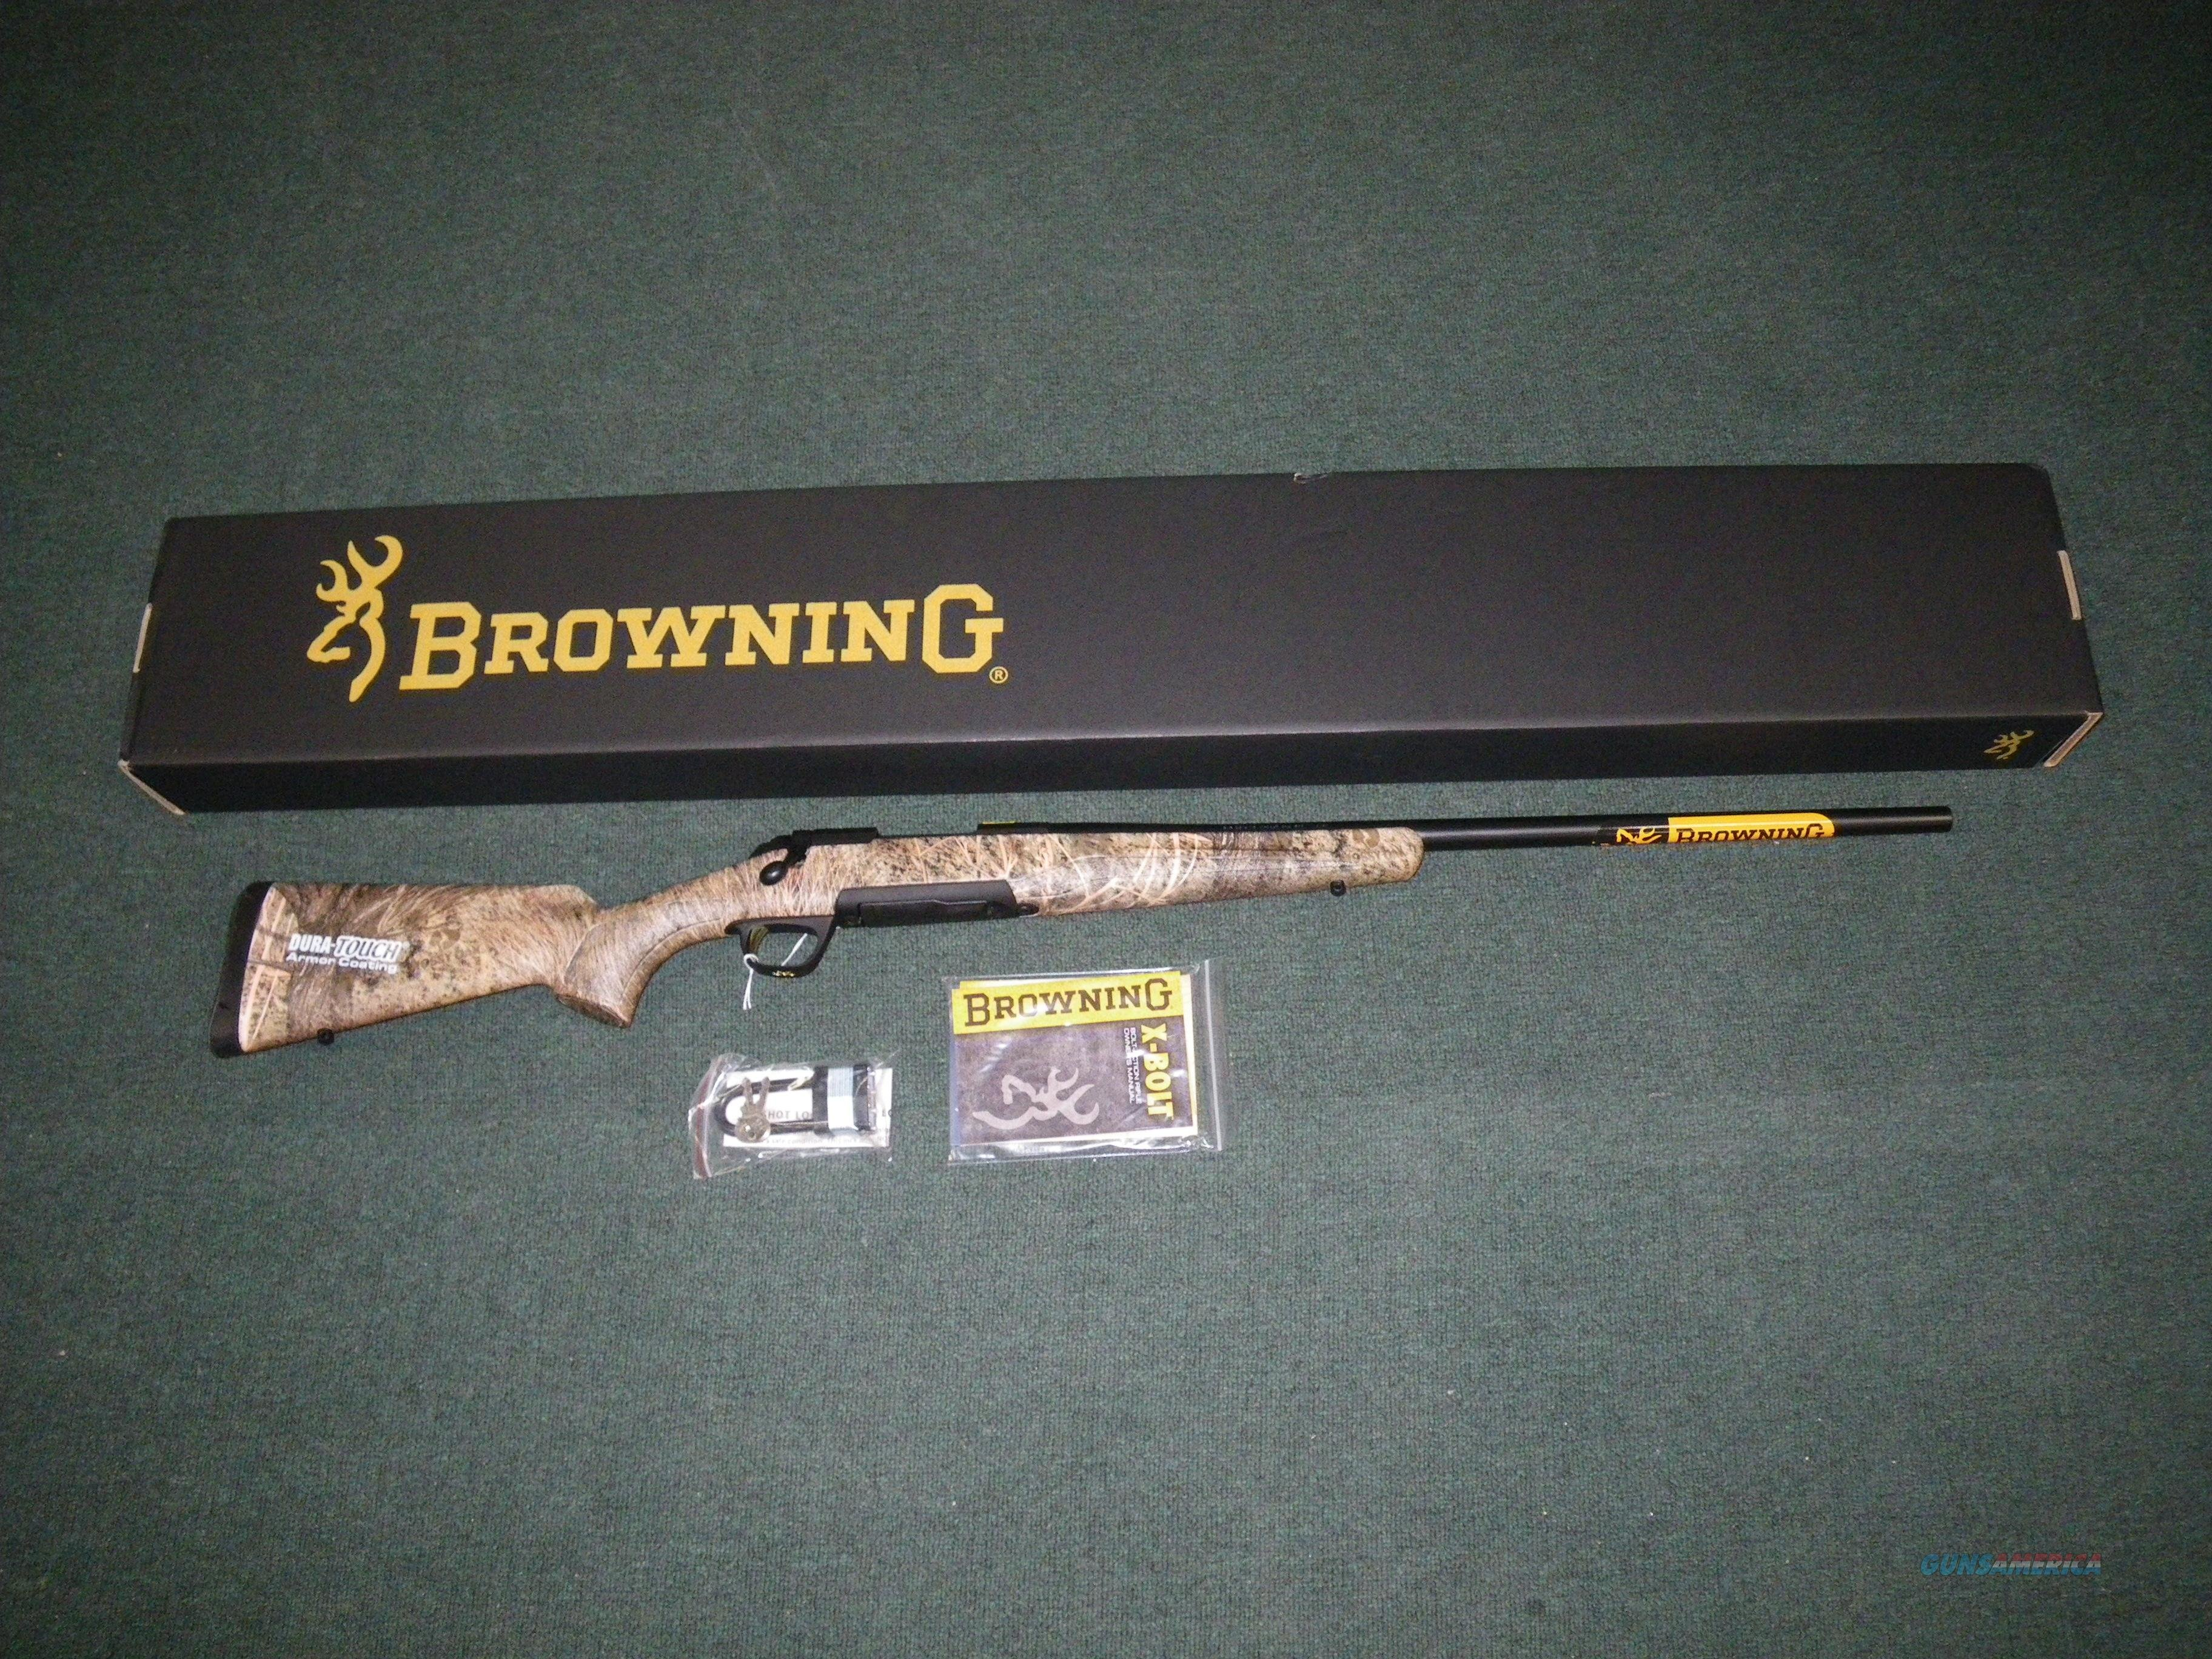 "Browning X-Bolt Varmint Stalker MOBR 308 Win 24"" #035334218  Guns > Rifles > Browning Rifles > Bolt Action > Hunting > Blue"